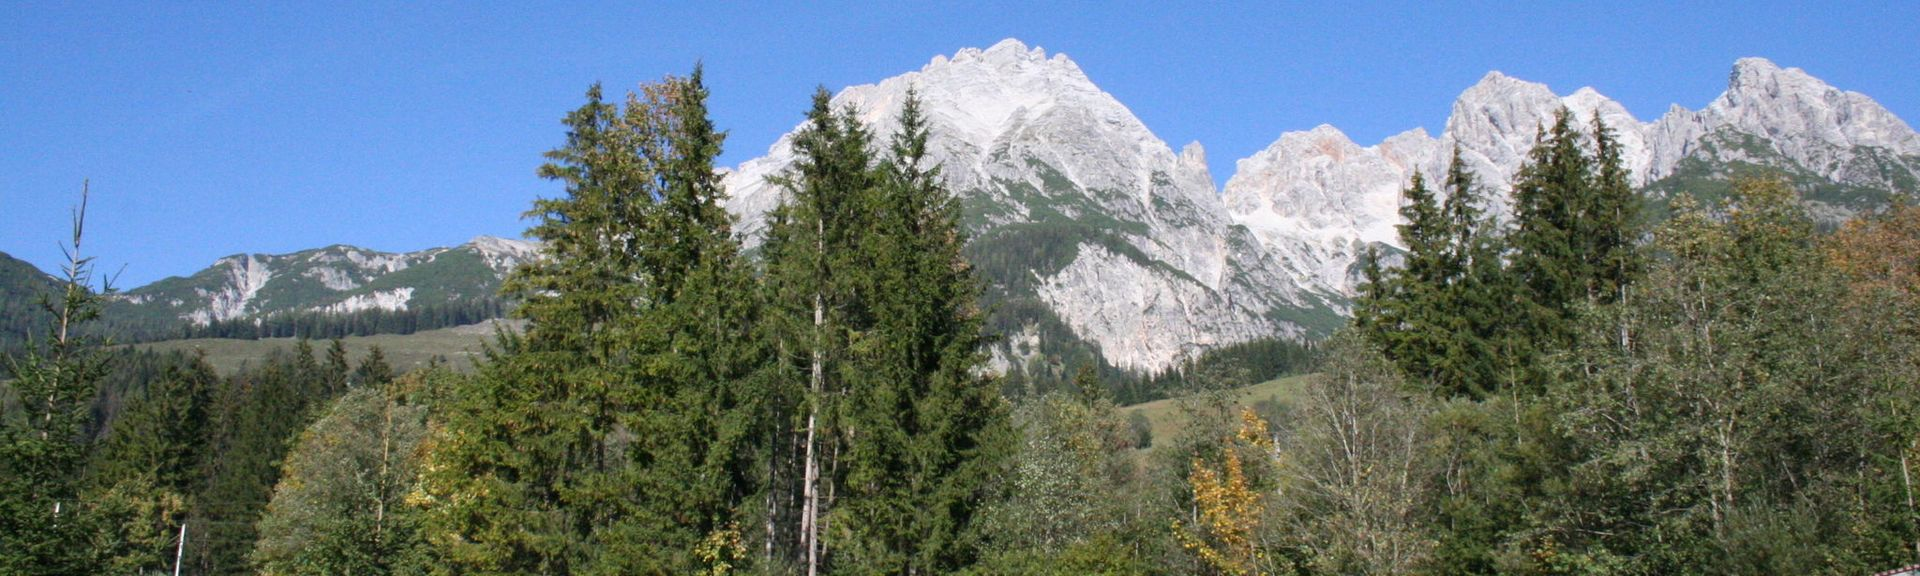 Pillersee, St. Ulrich Am Pillersee, Tyrol, Áustria